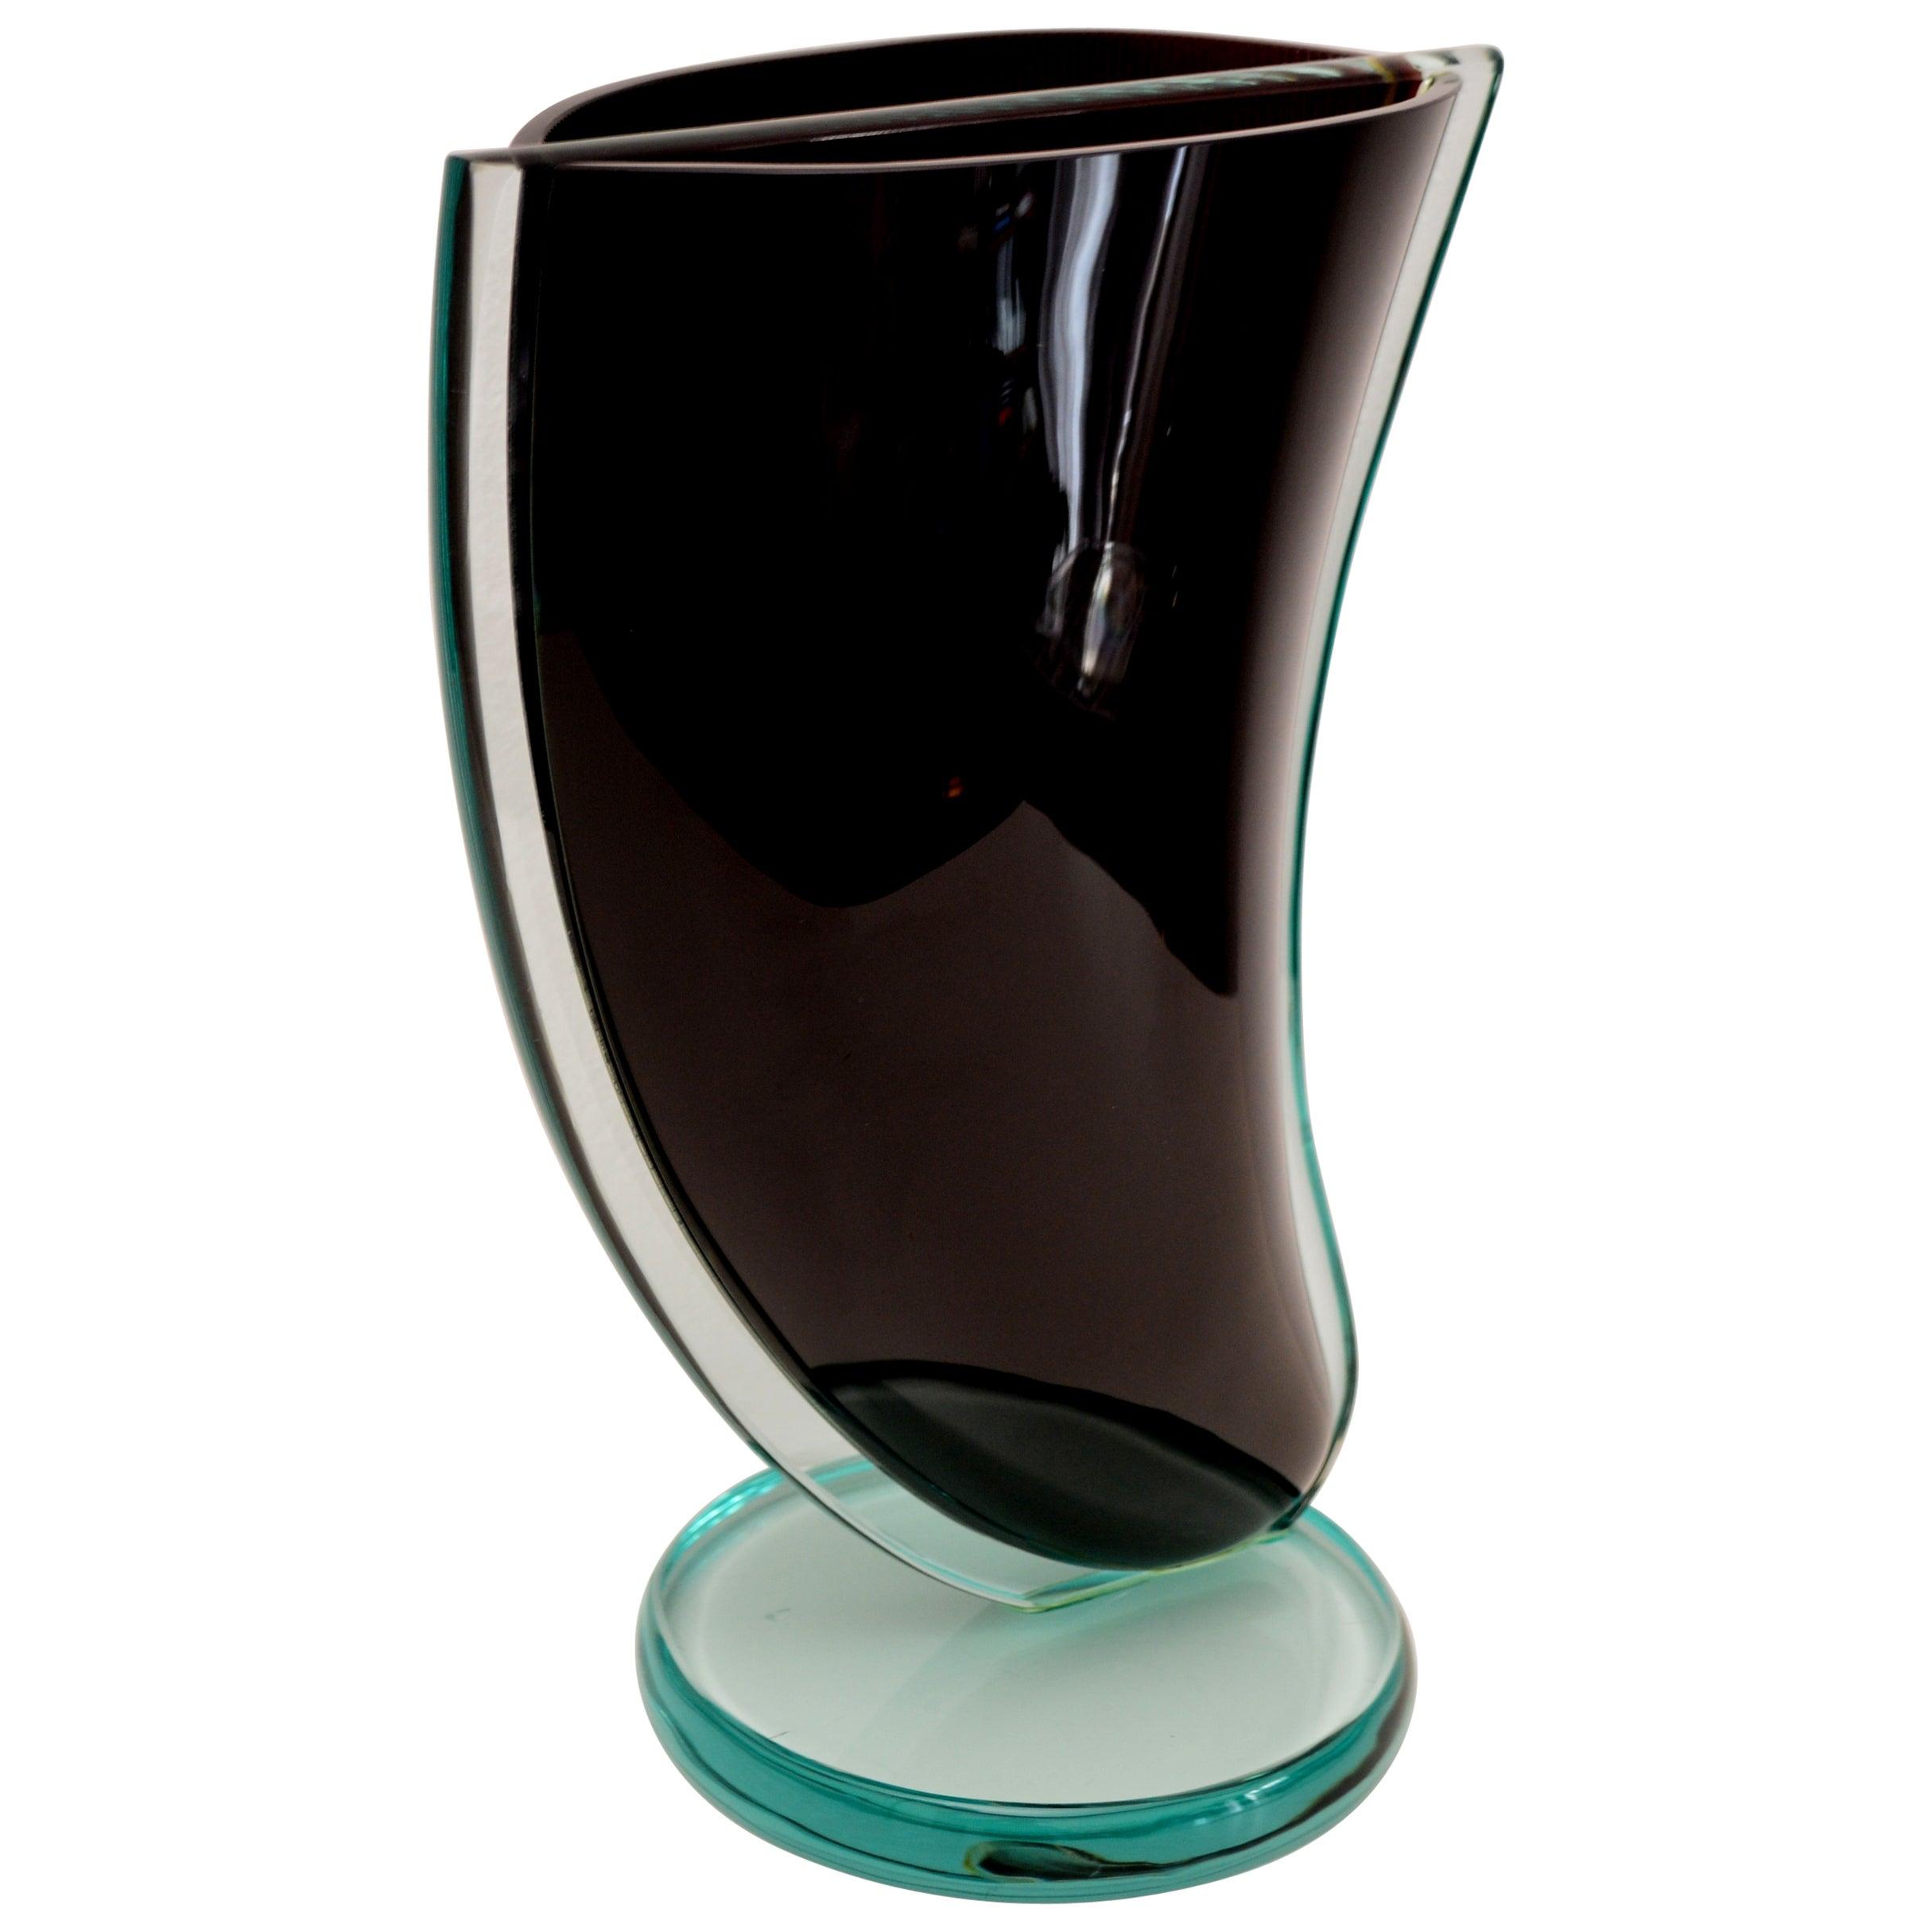 Italian Midcentury Murano Art Glass Sculpture Collectors Vase, Signed, 1970s